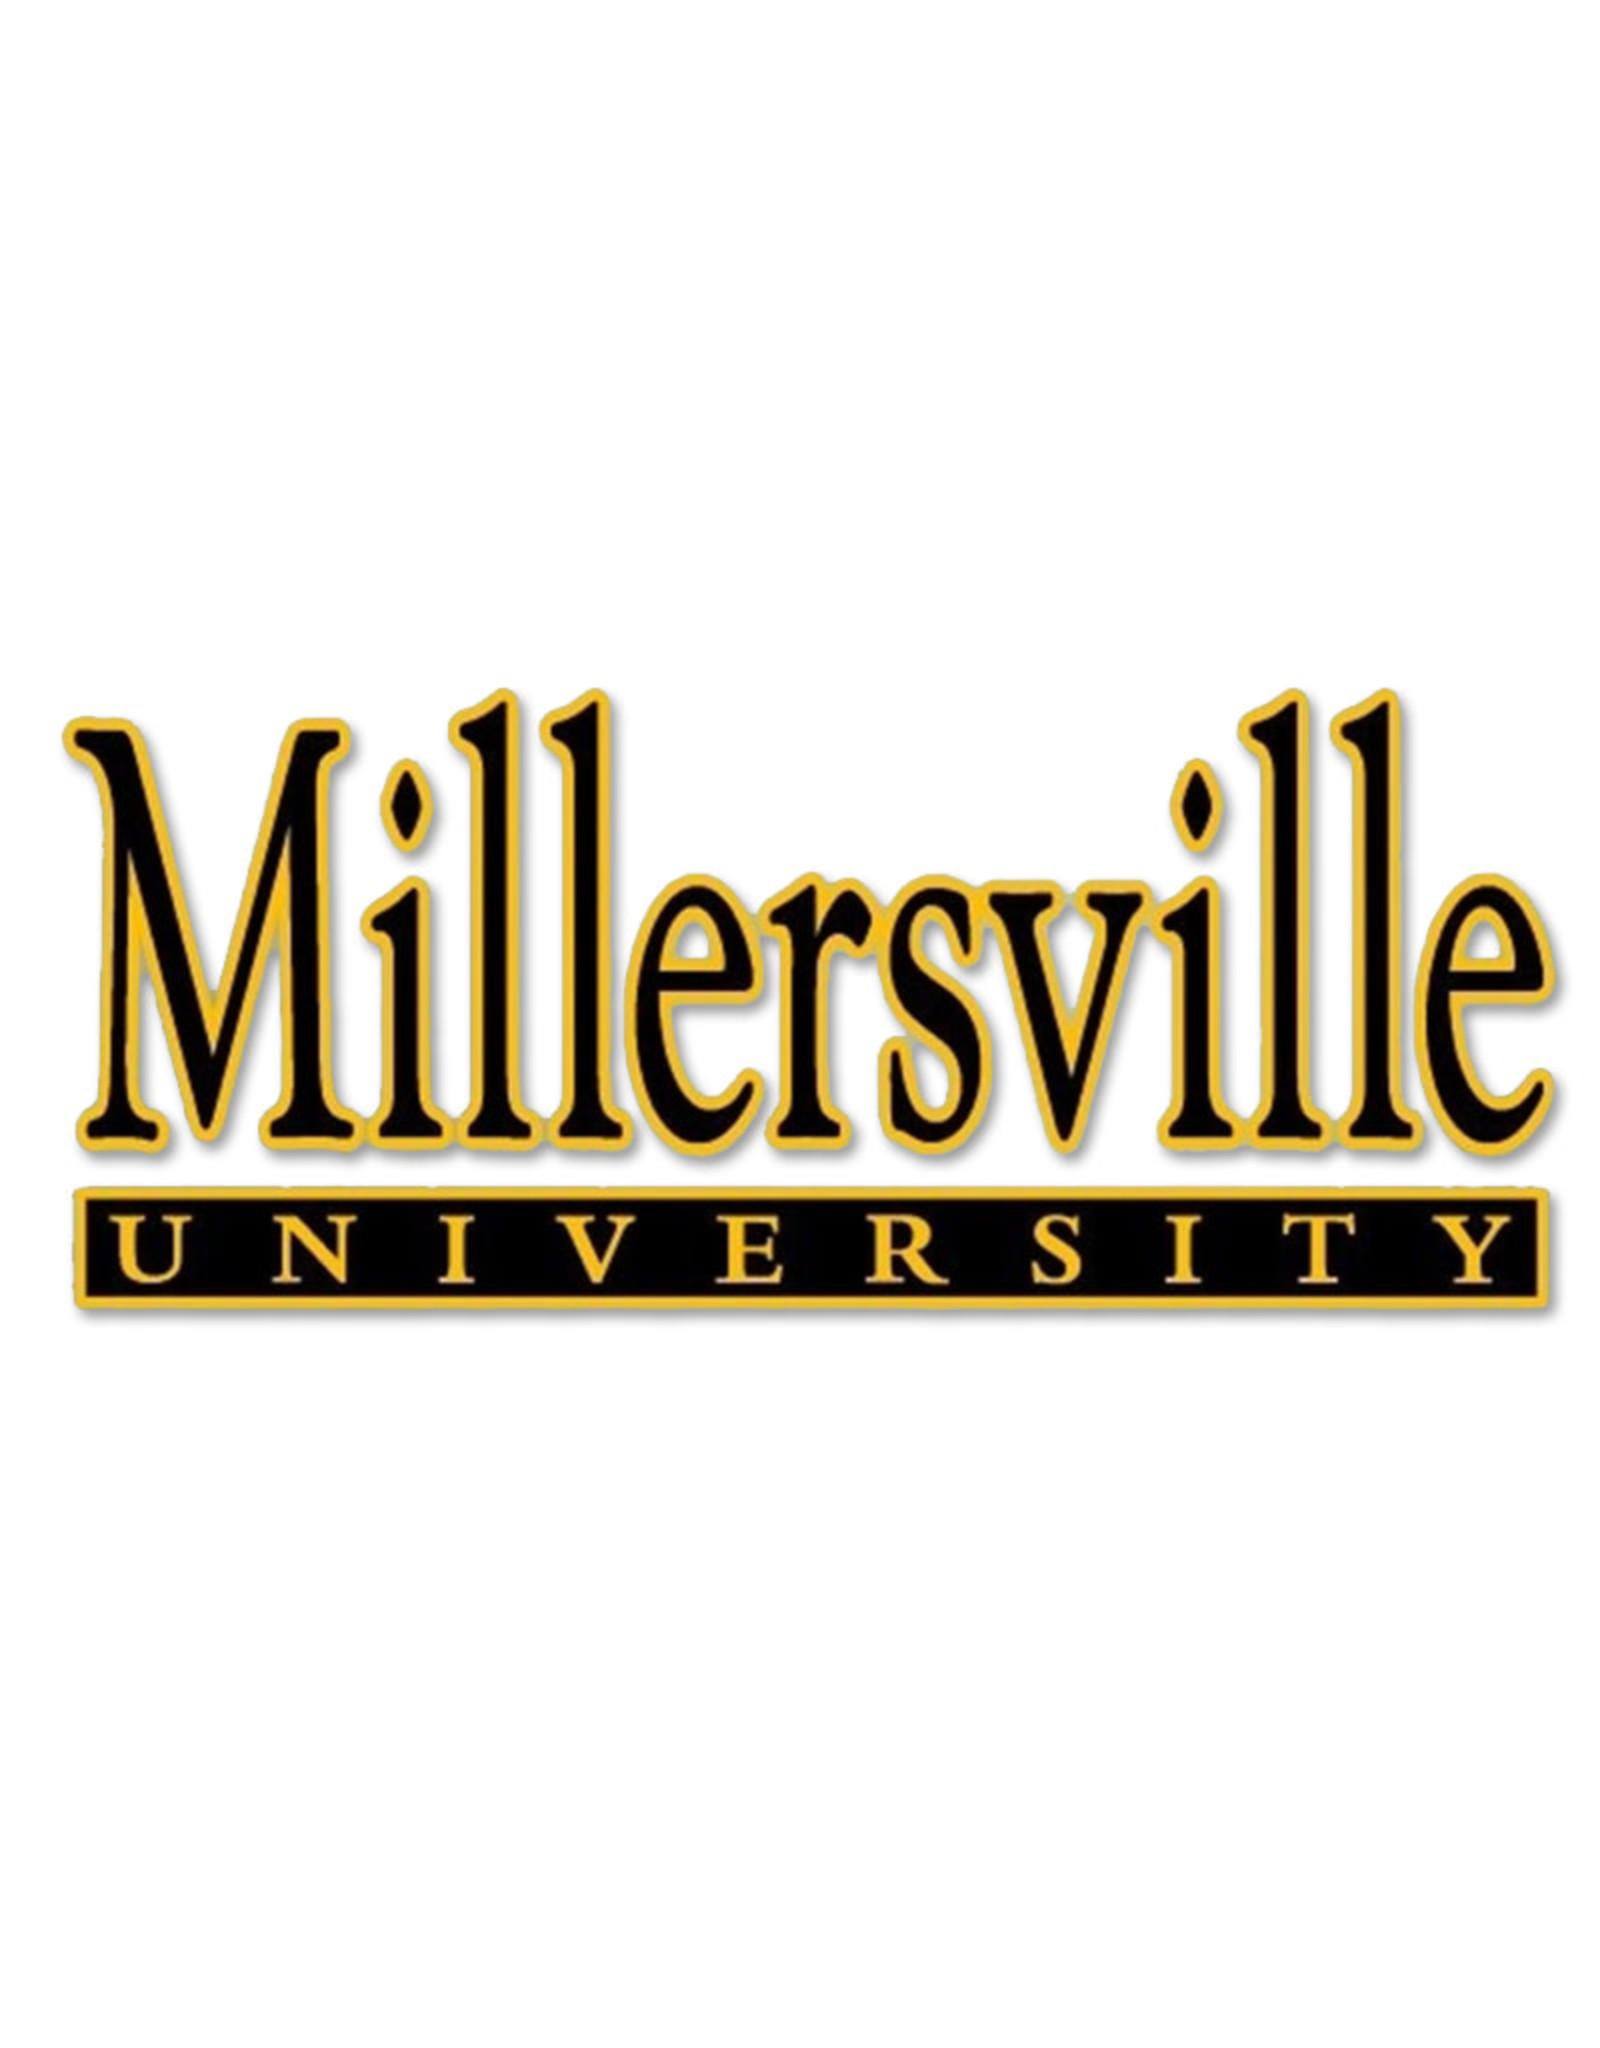 Millersville University Decal